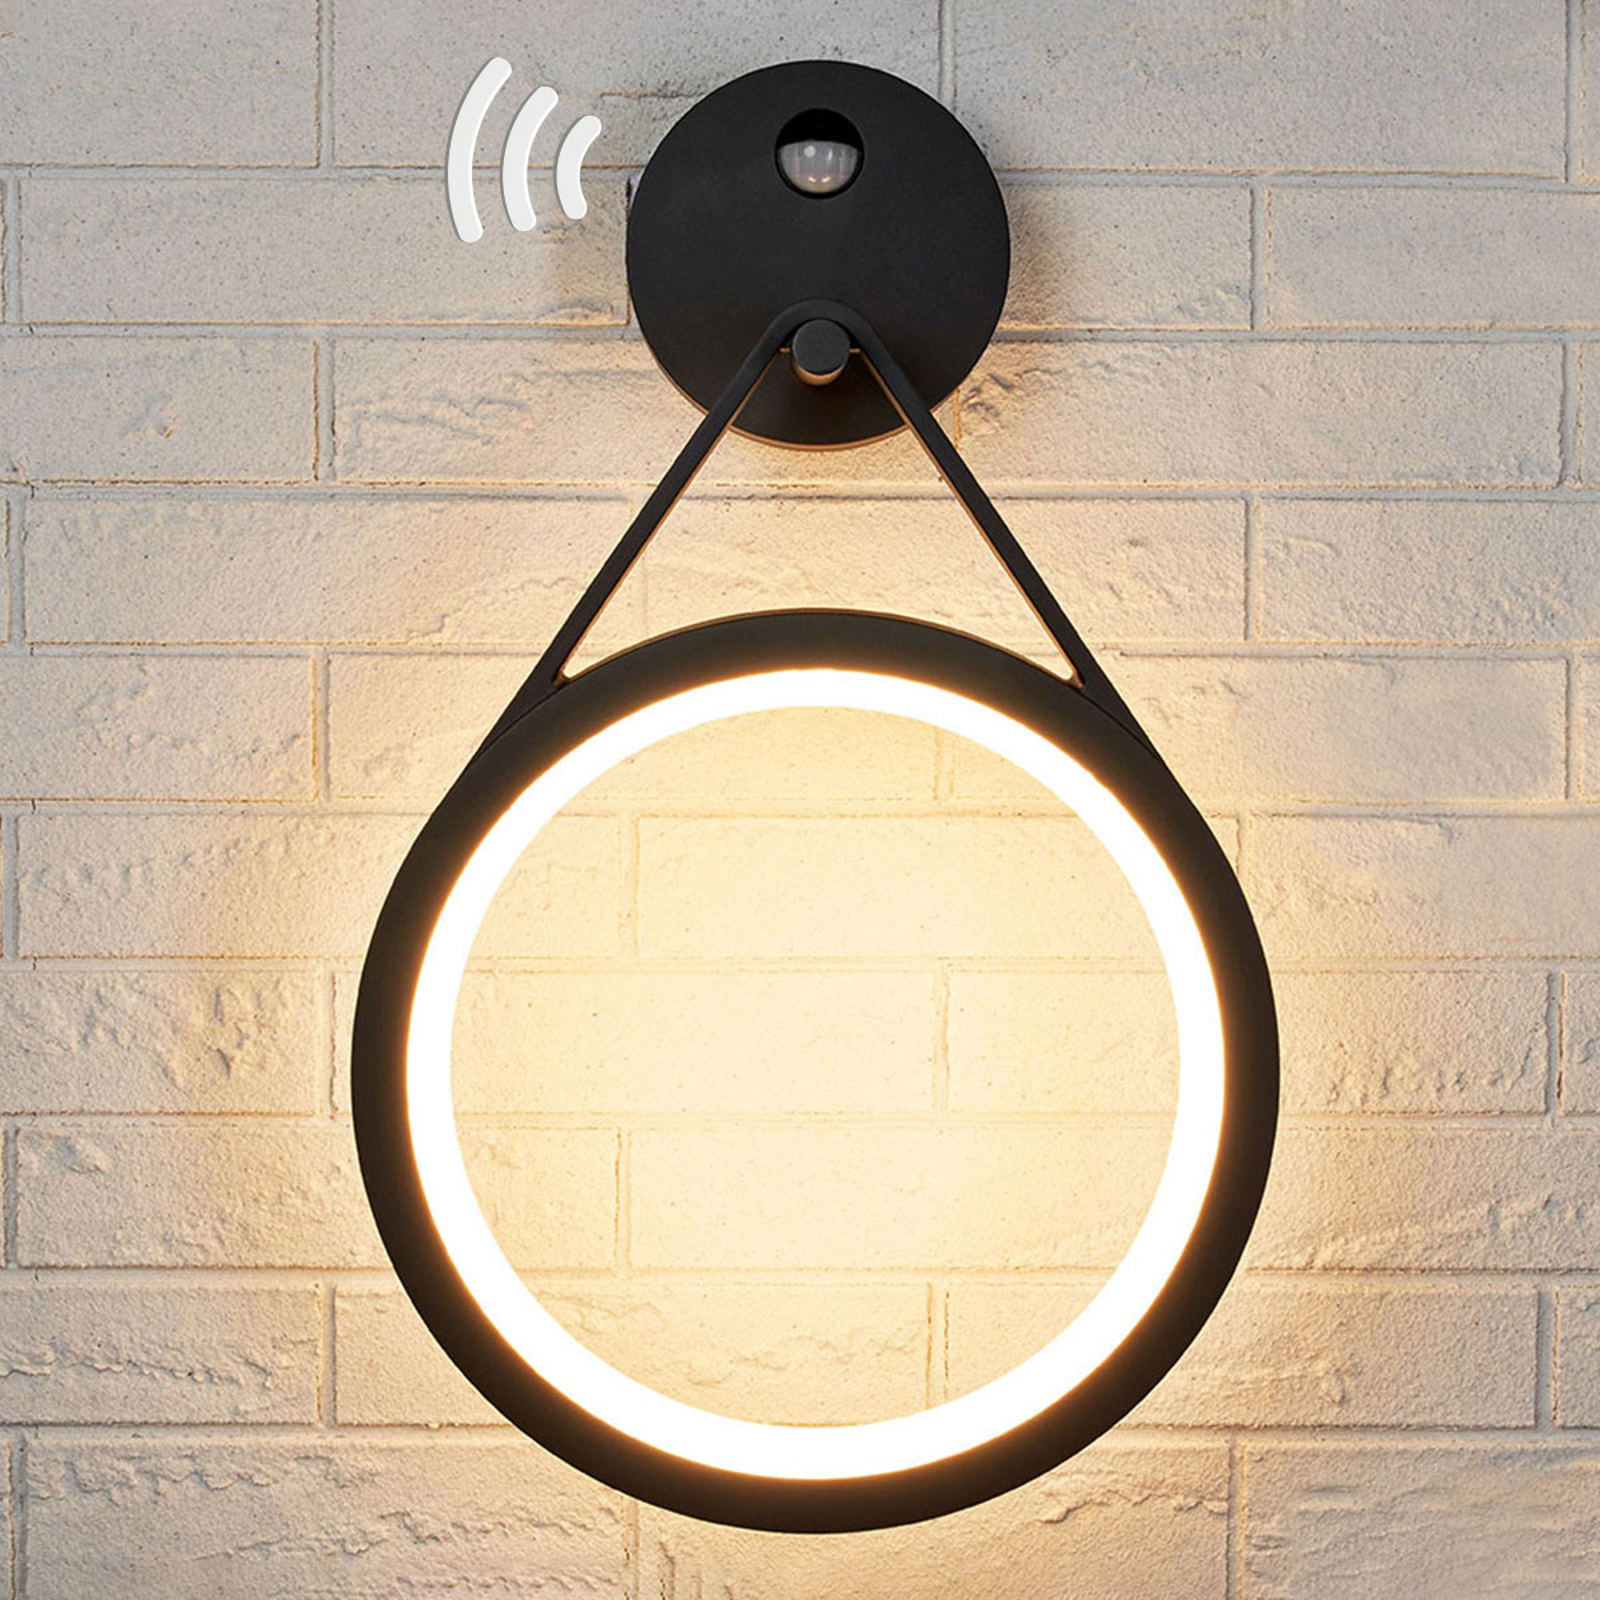 LED-Außenwandlampe Mirco mit Sensor, ringförmig